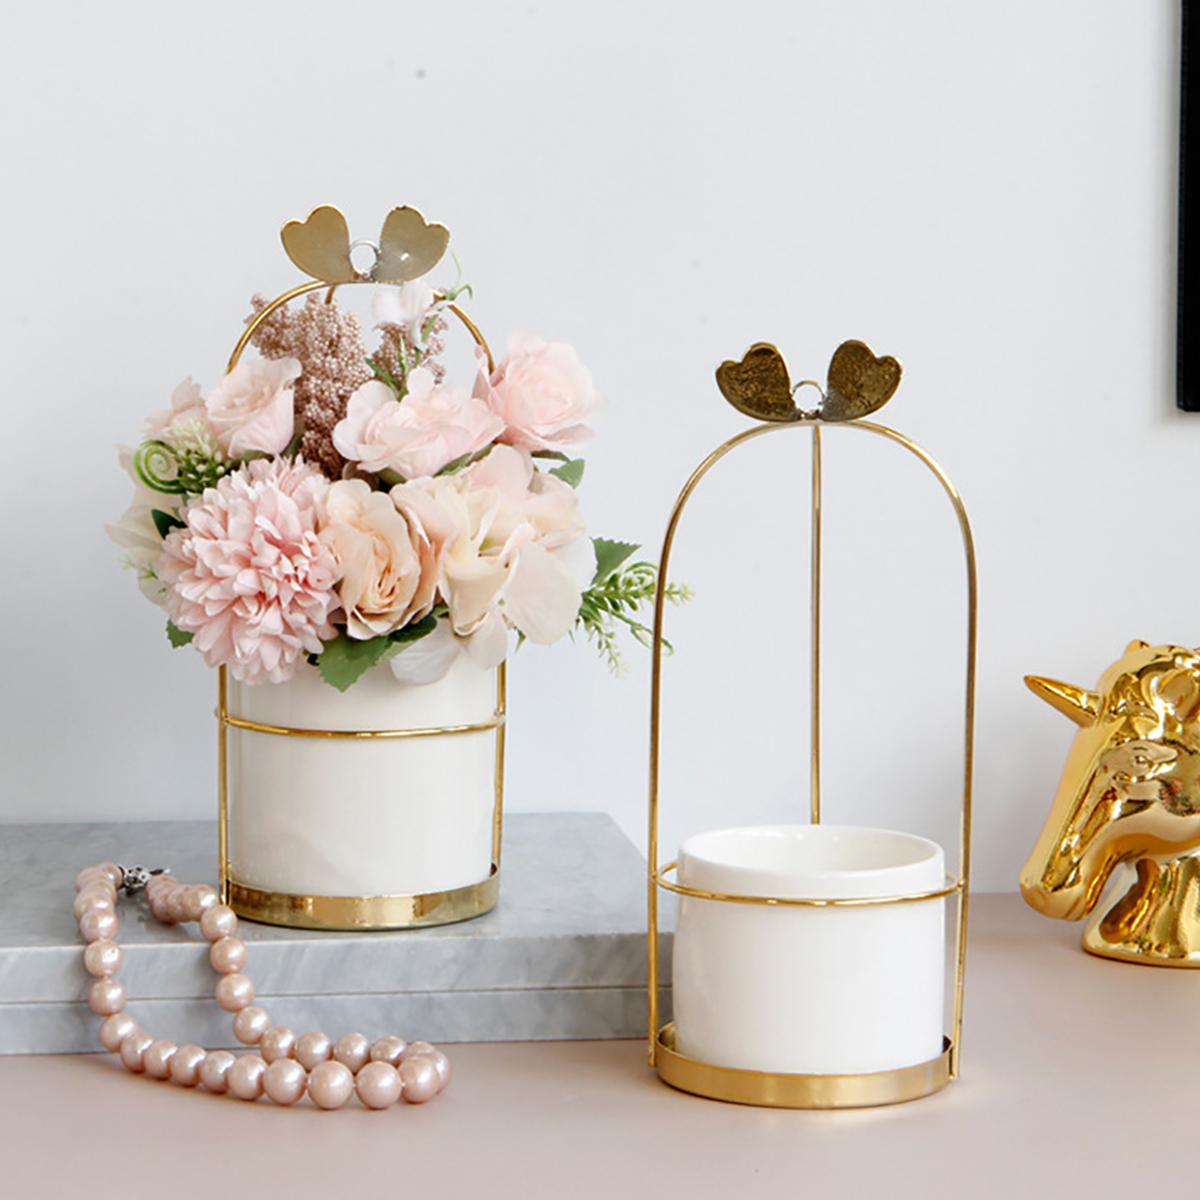 Nordic Vase Hanging Basket Wrought Iron Flower Pot Hanging Iron Frame Flower Stand Hydroponic Flower Pot Modern Wall Decoration Decoration